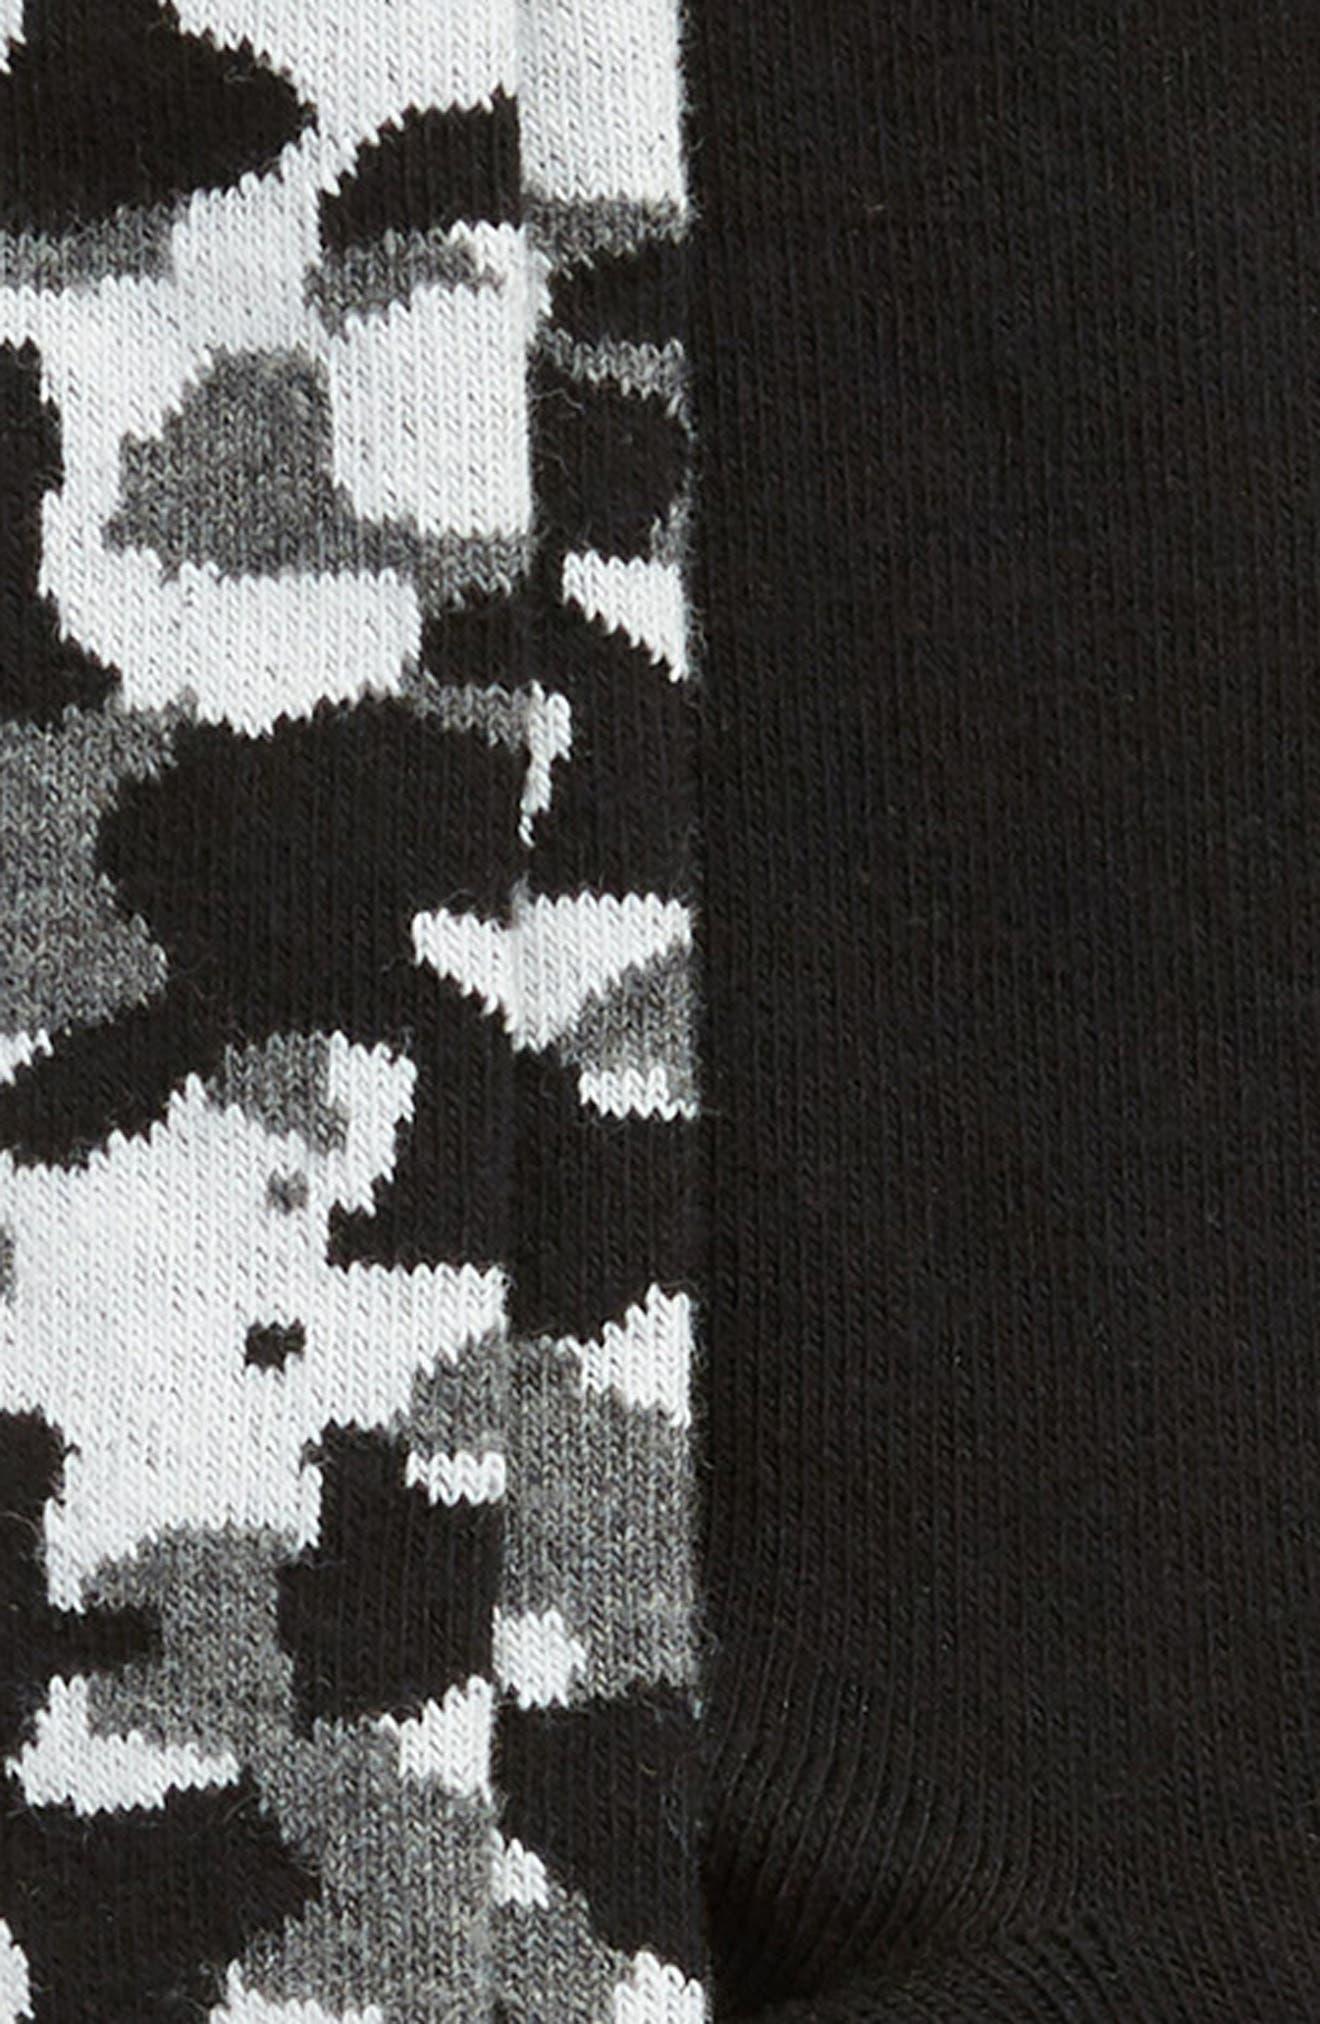 2-Pack Camo Cotton Blend Socks,                             Alternate thumbnail 2, color,                             BLACK